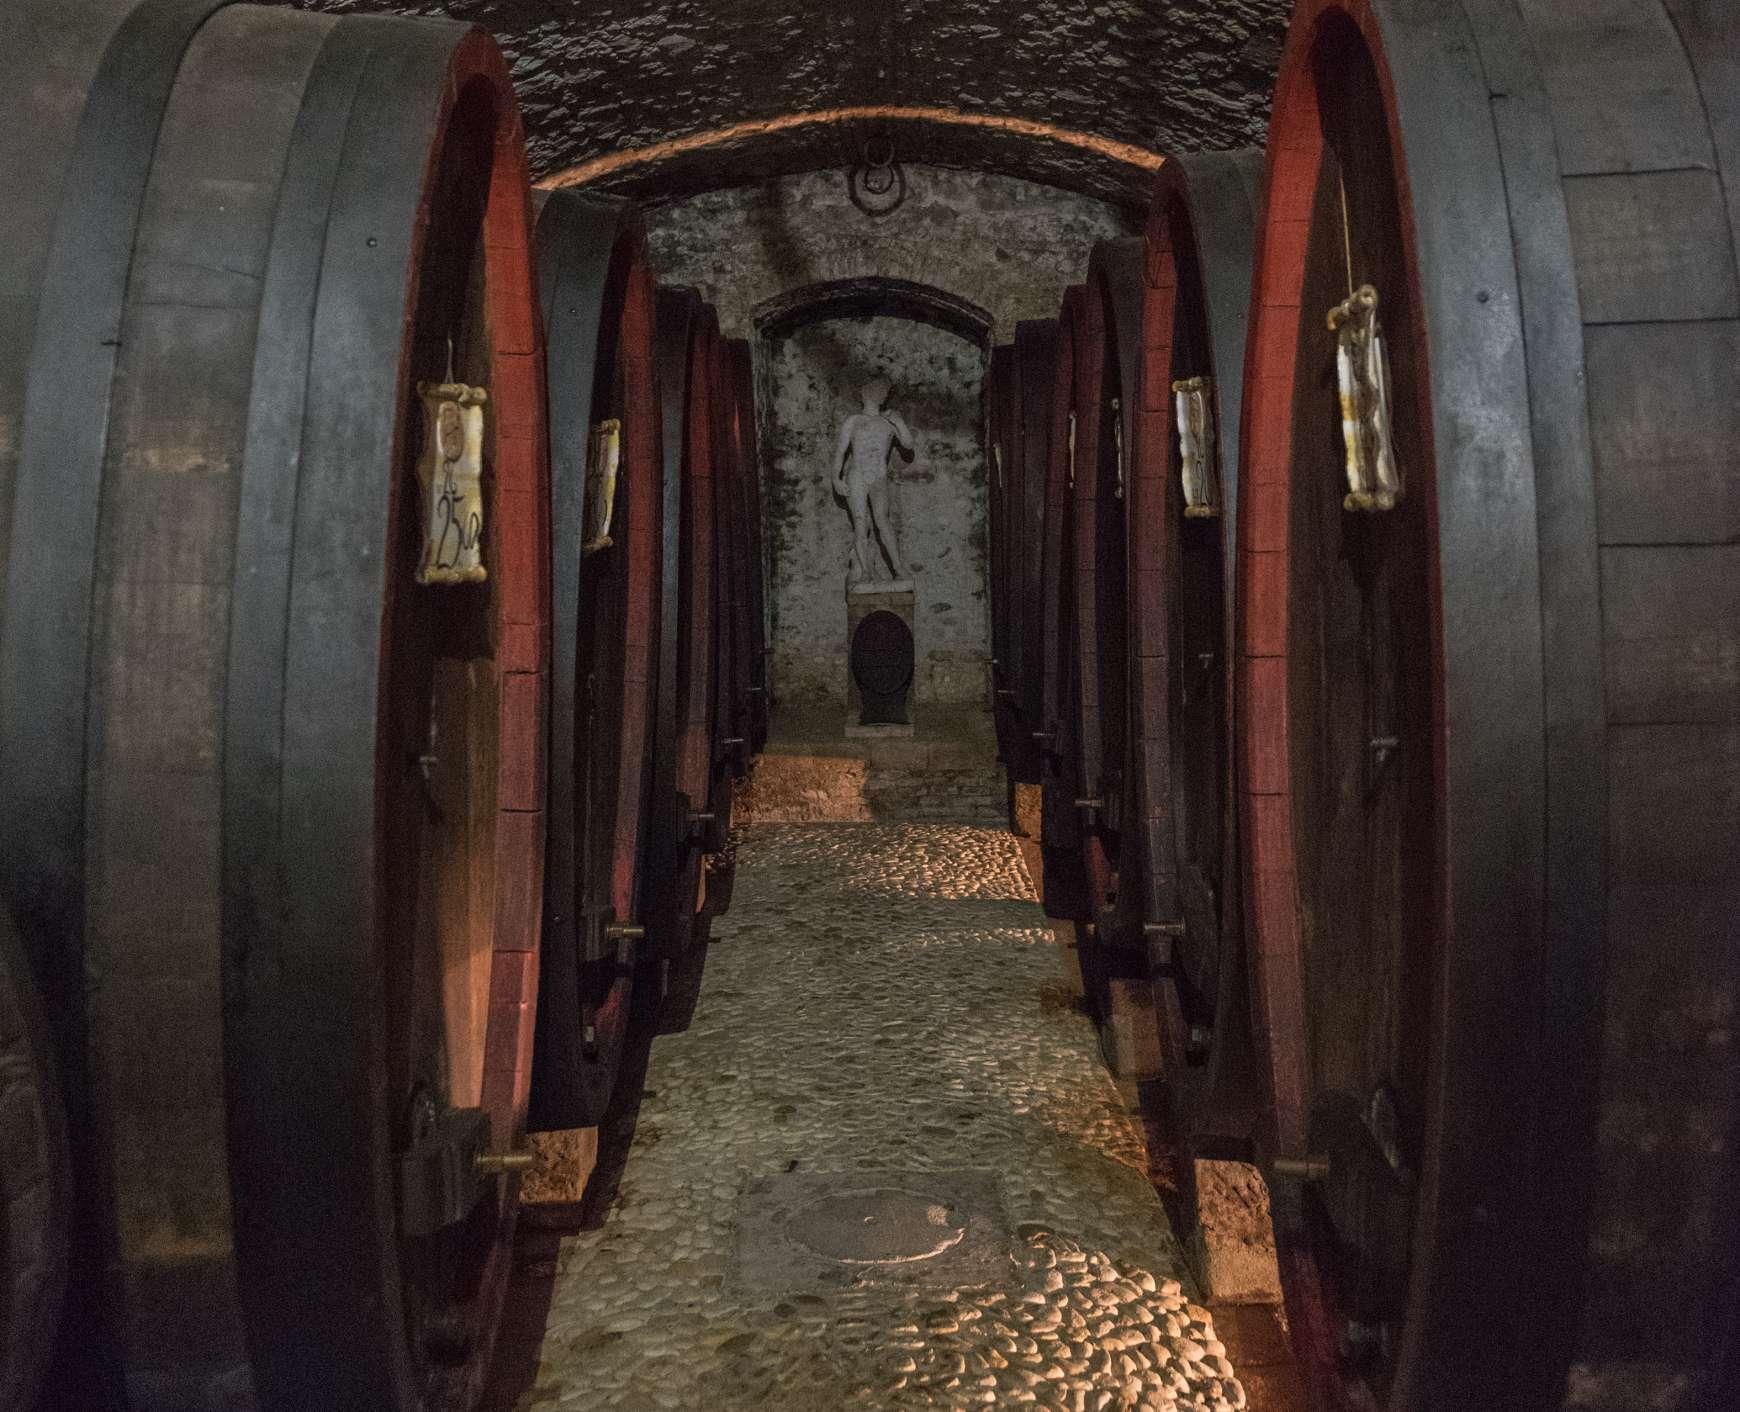 San Gimignano and Tour of Chianti Region